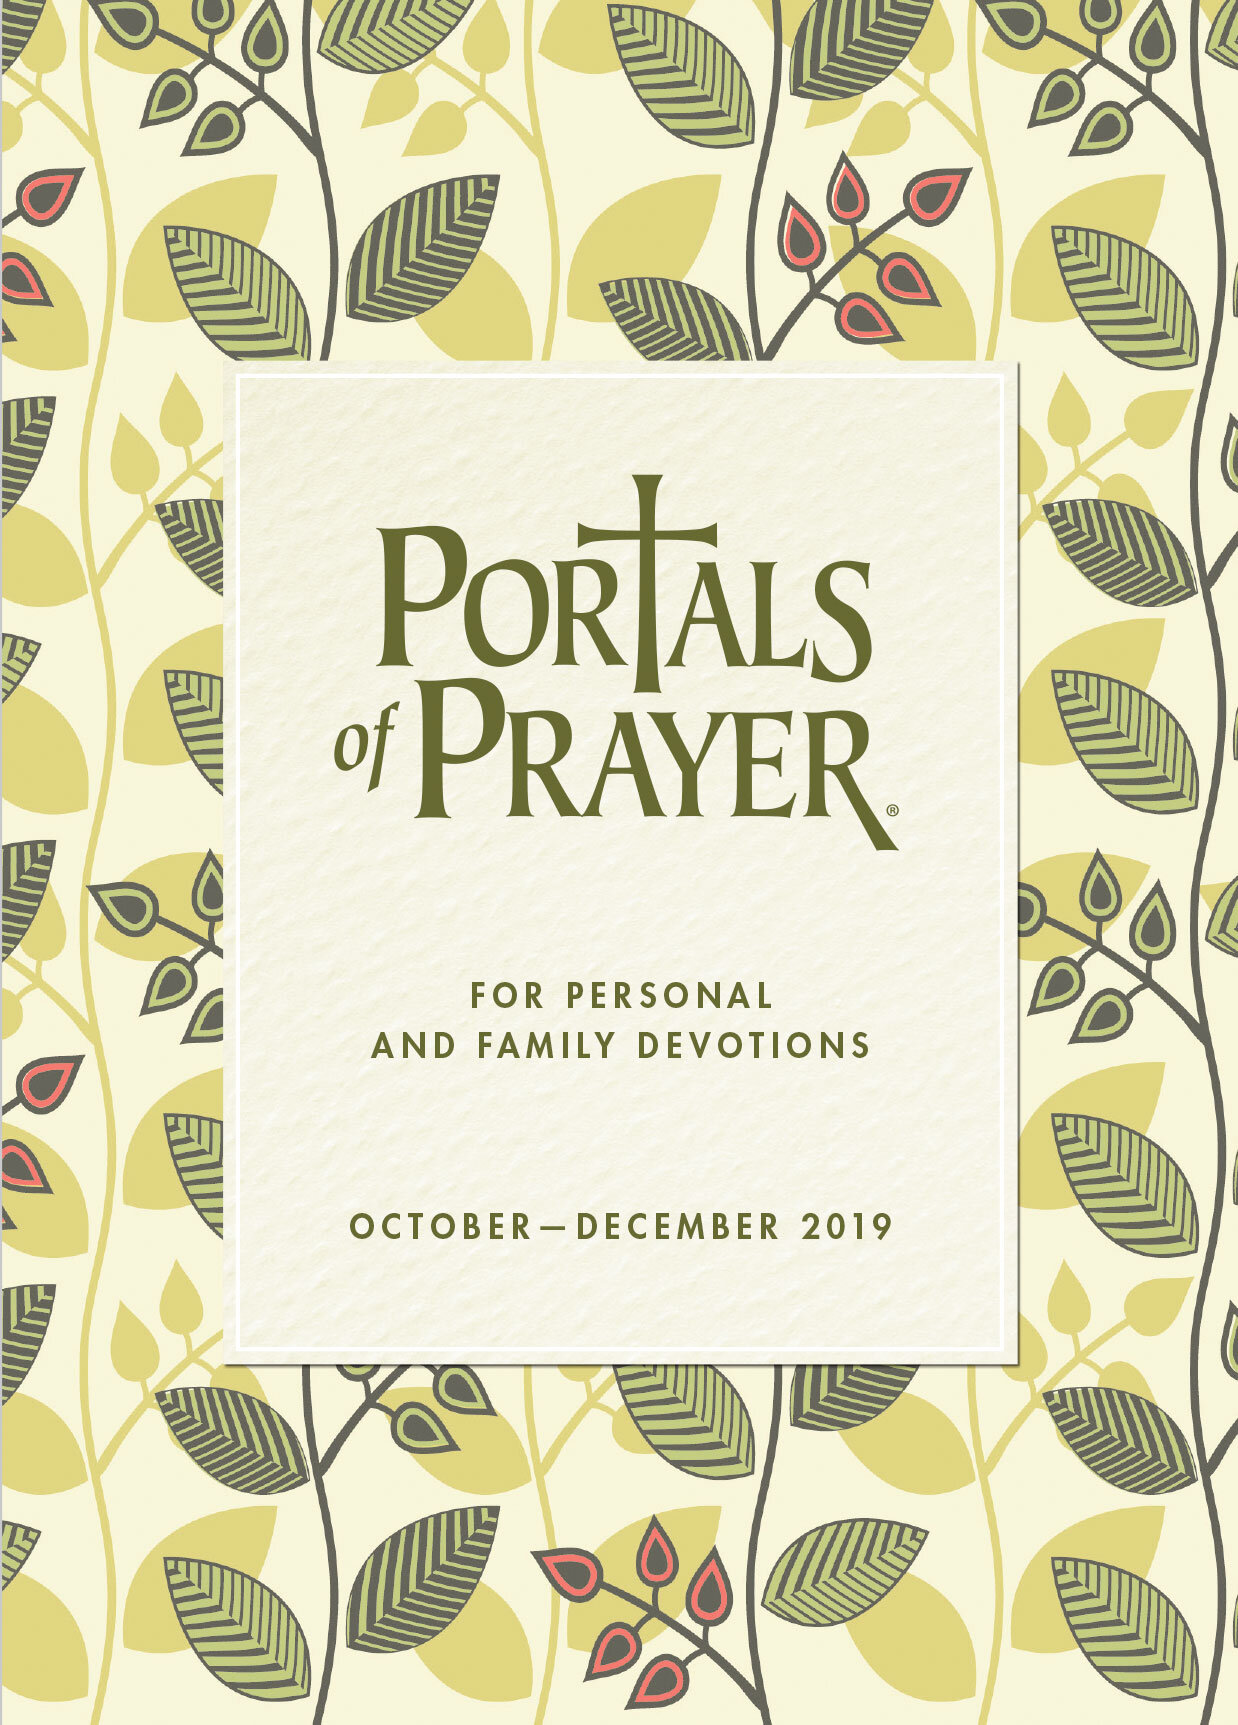 portals-of-prayer-4th-qtr-2019.jpg